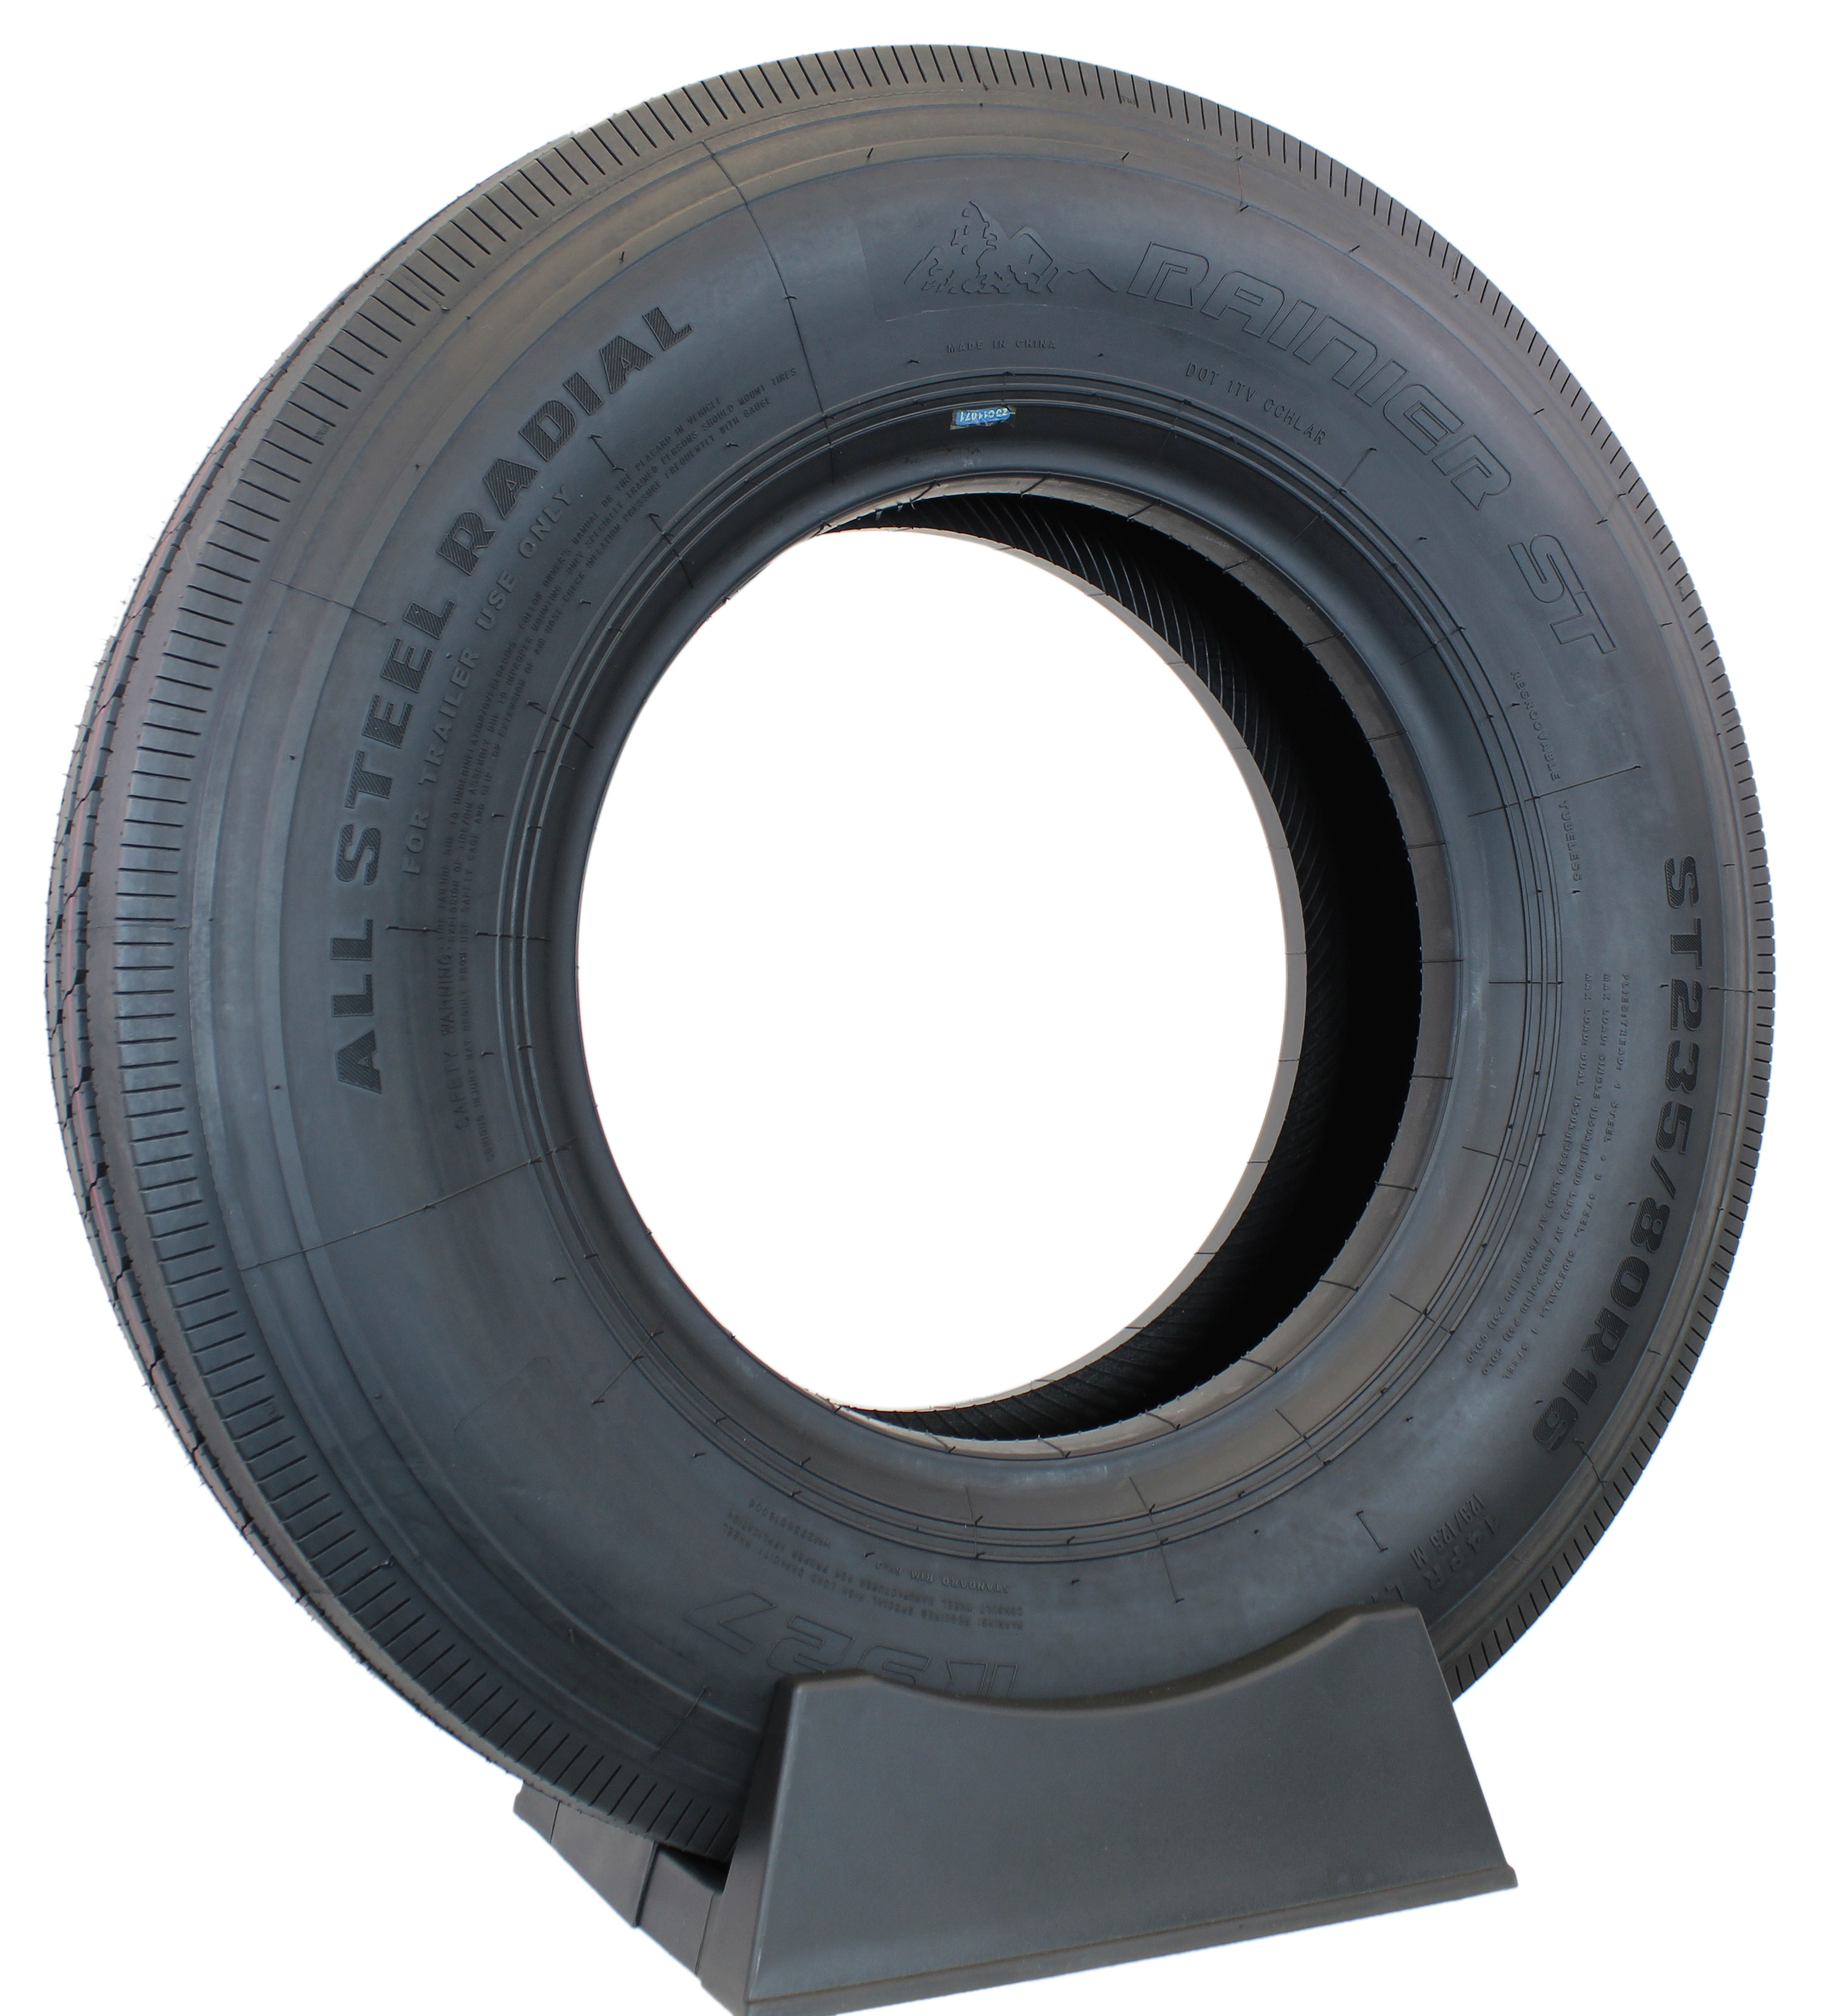 Rainier ST All-Steel ST235/80R16 LRG Radial Trailer Tire Image